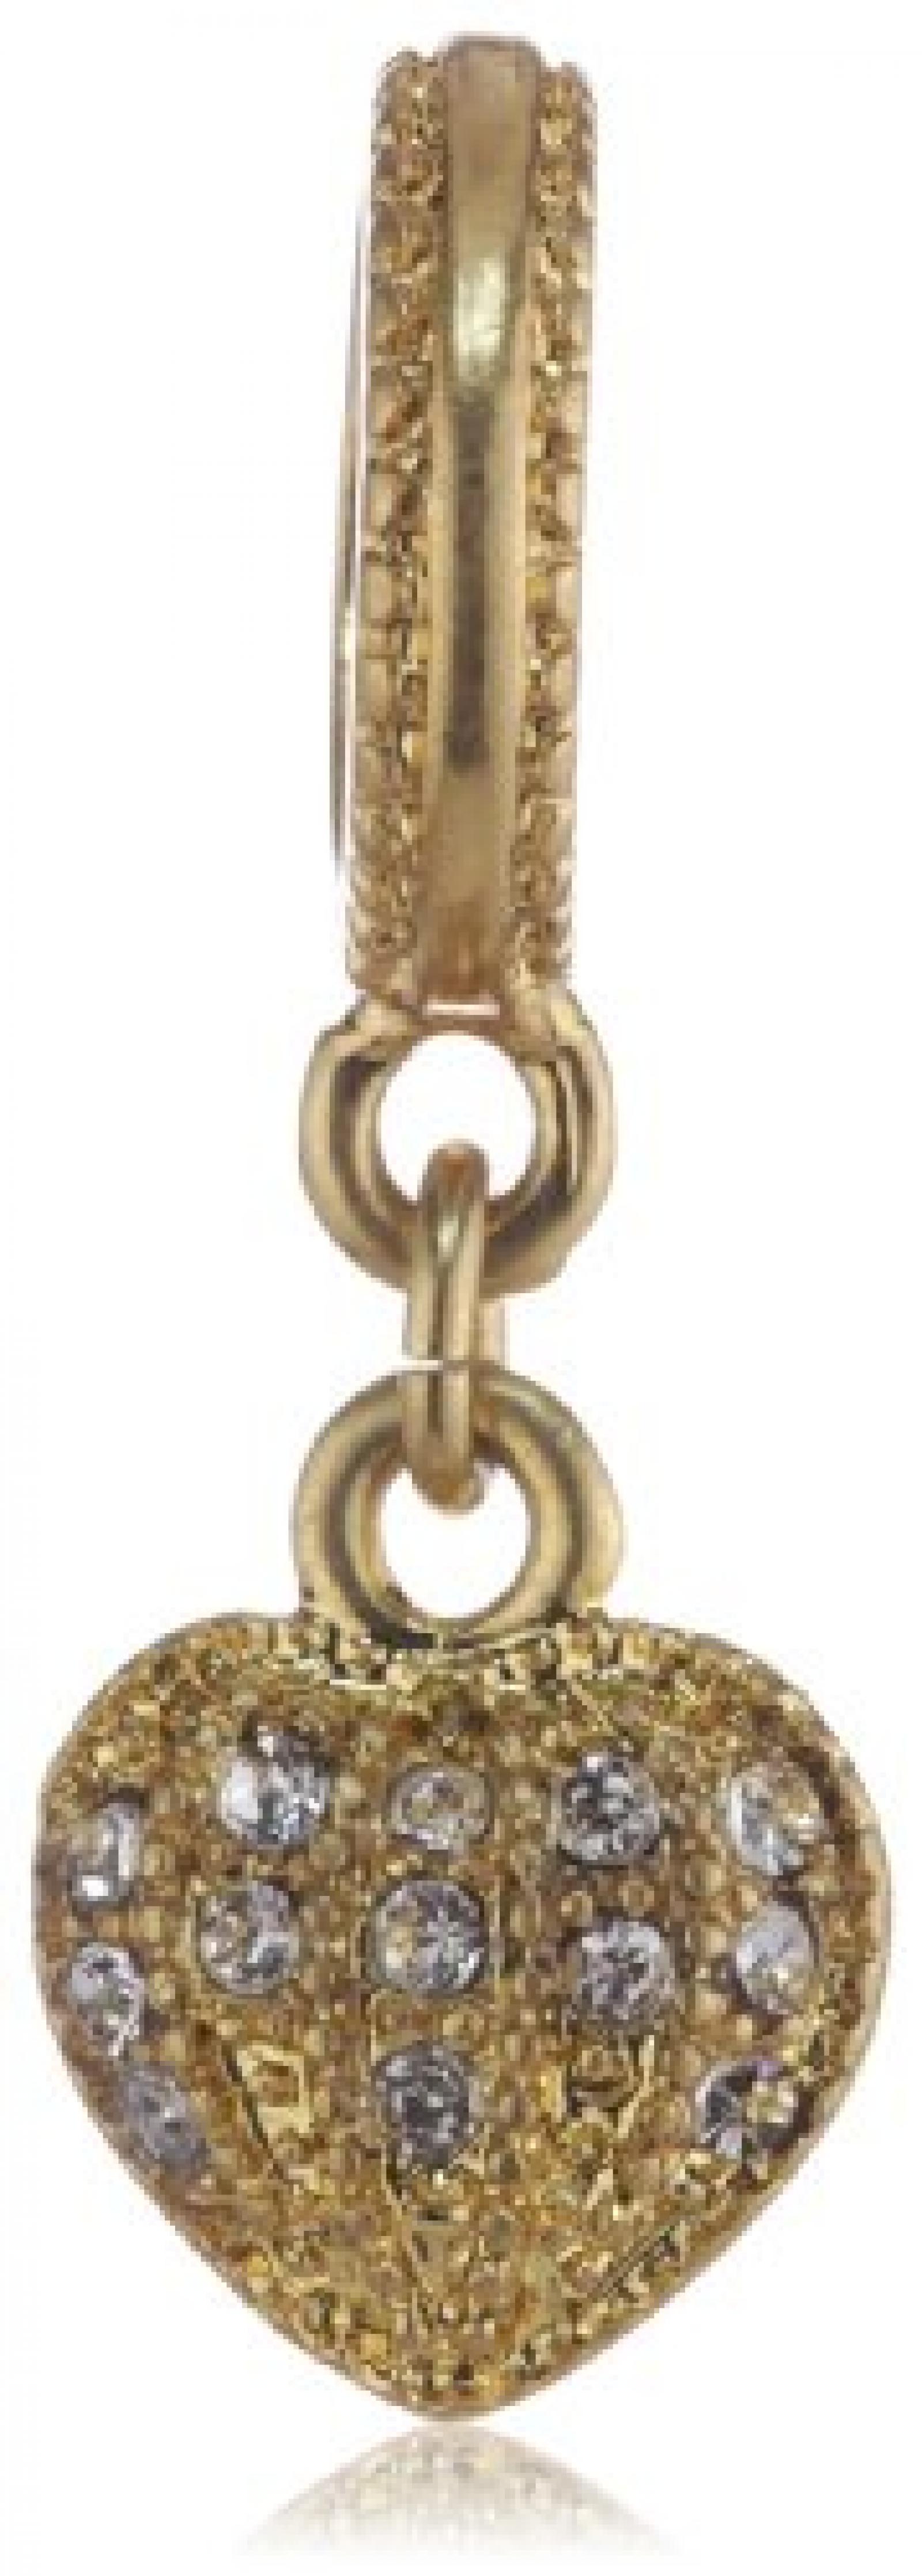 Pilgrim Jewelry Damen-Anhänger aus der Serie Charming vergoldet kristall 6.5 cm 421232009